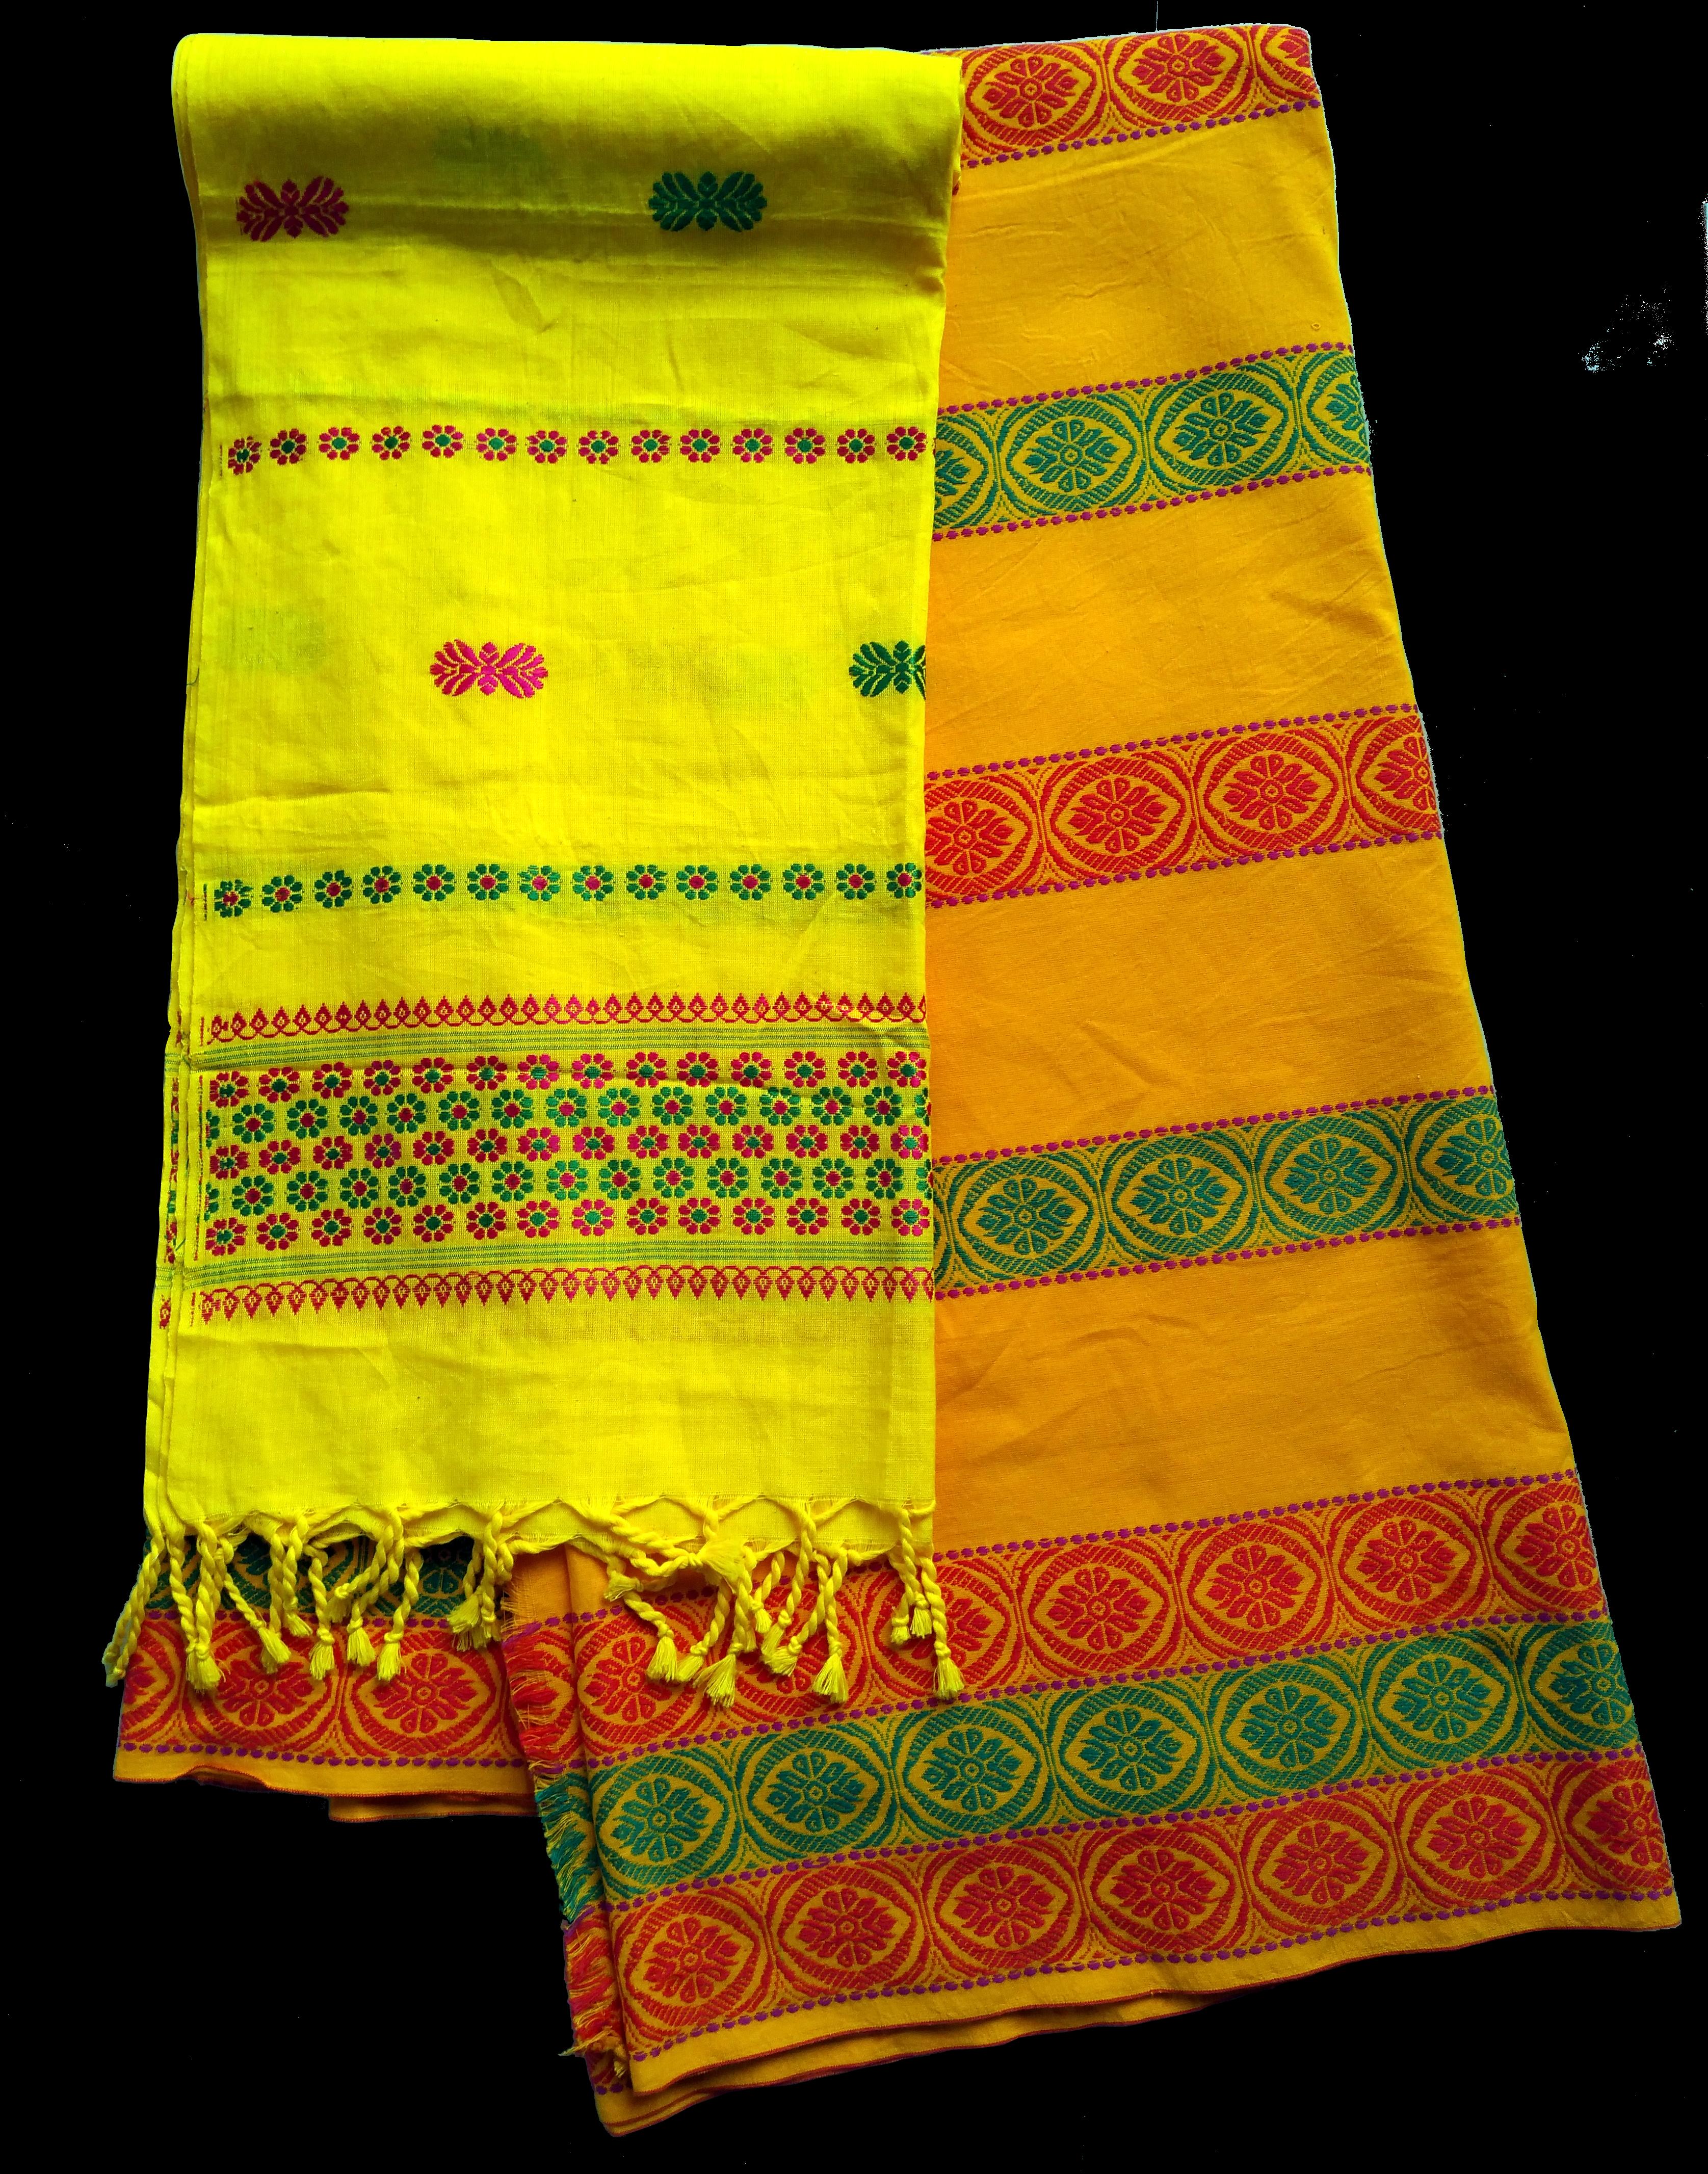 A jomgro and dhokana ensemble